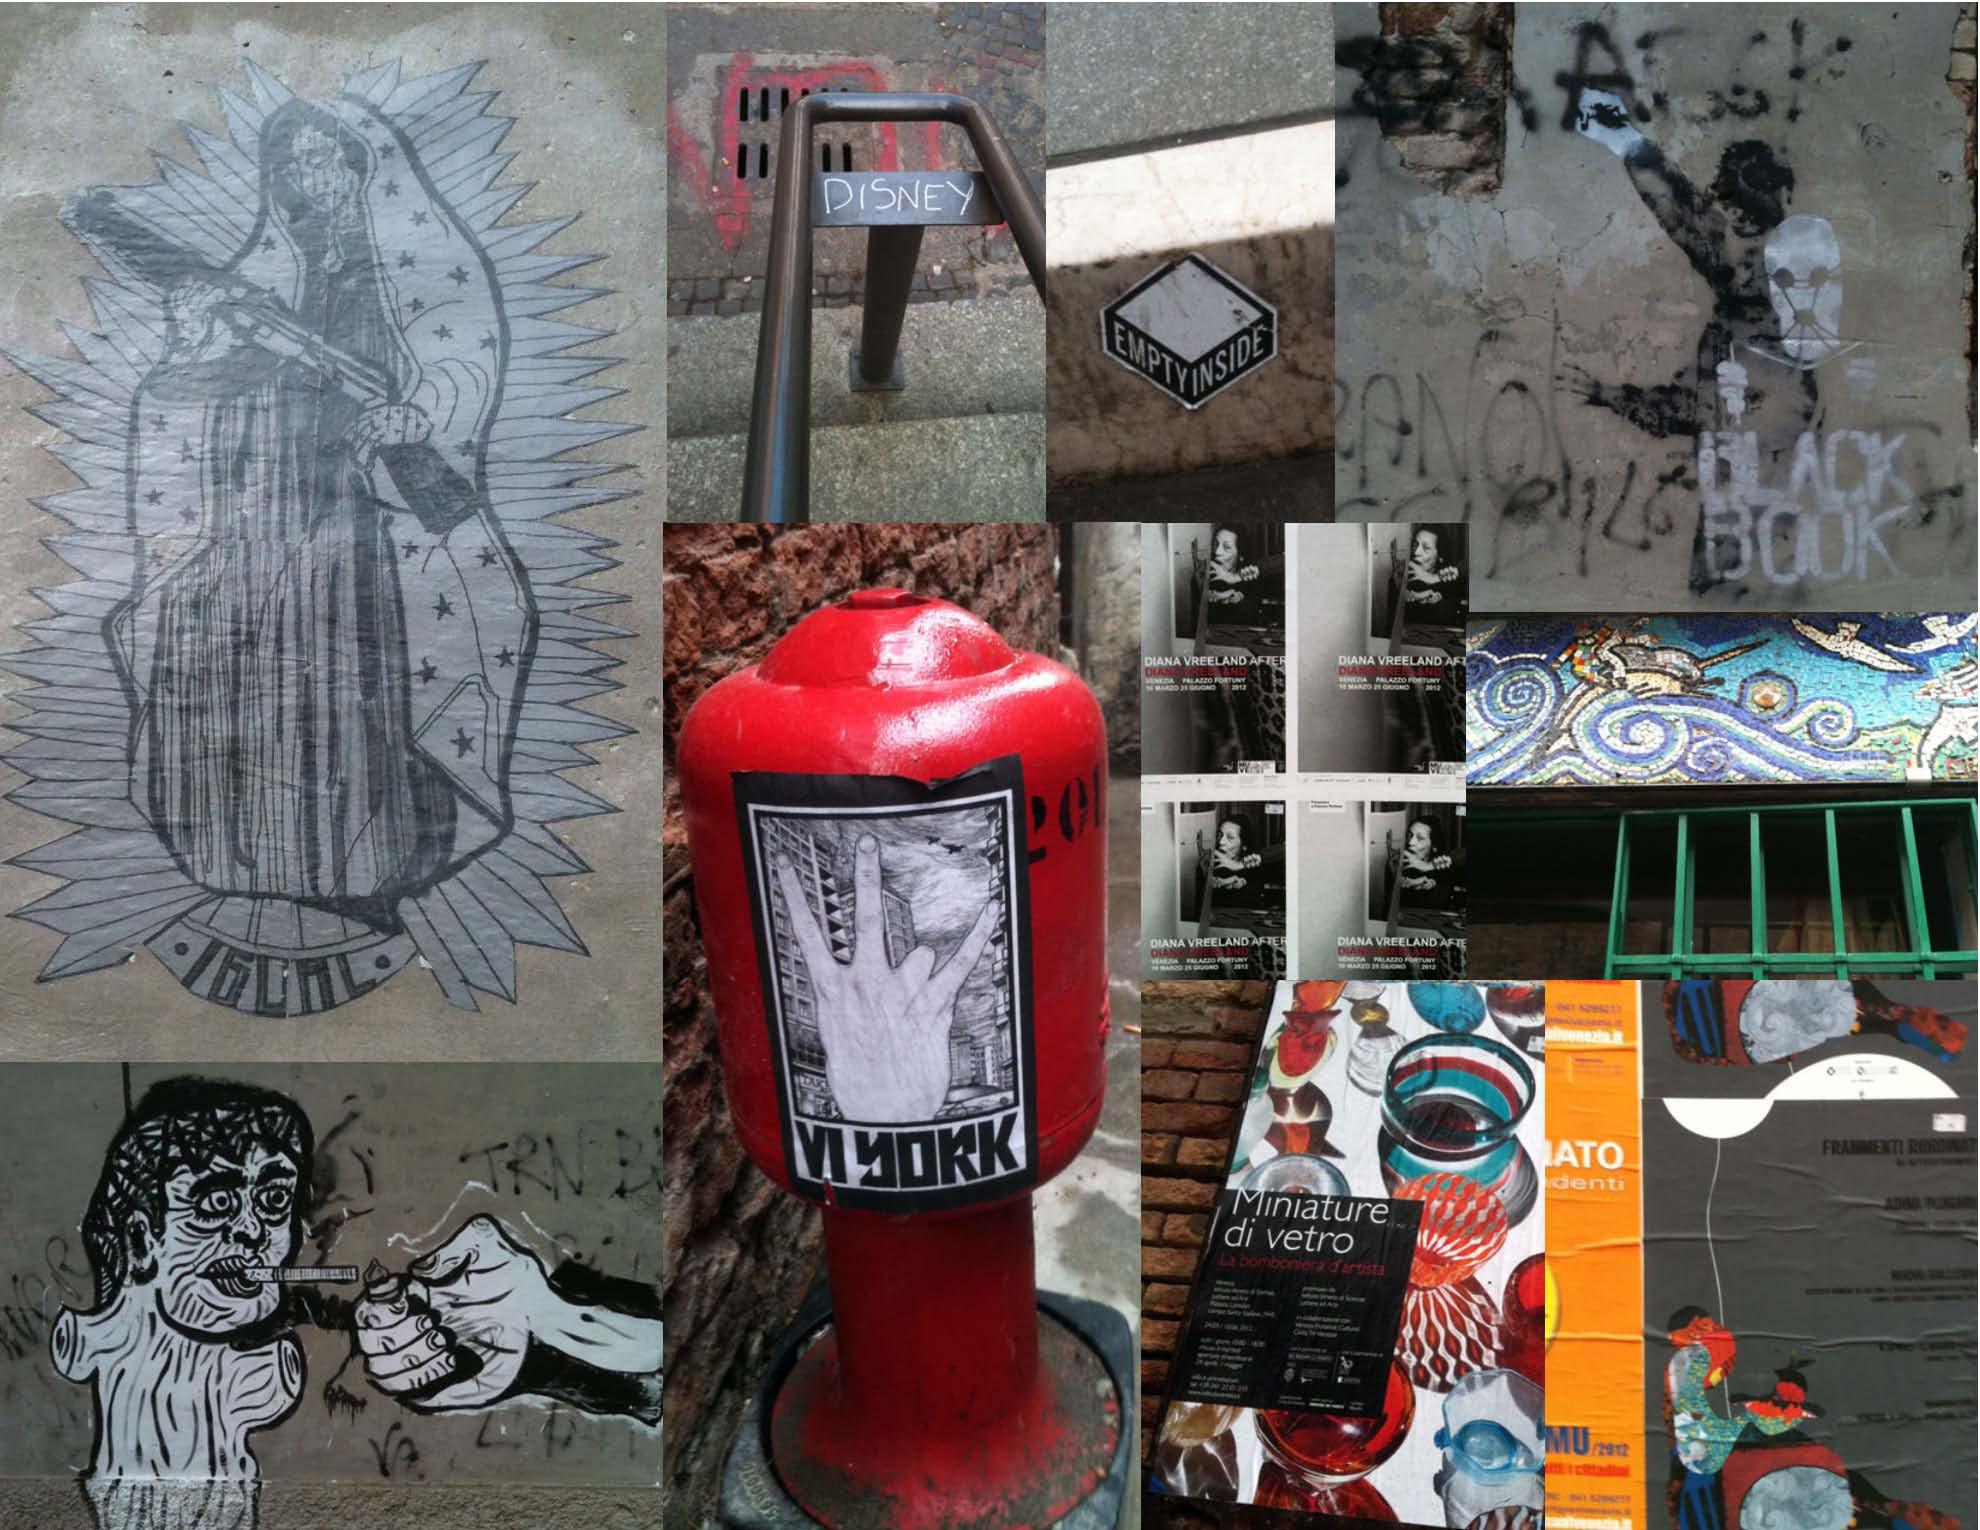 Italy_street art_Page_1.jpg